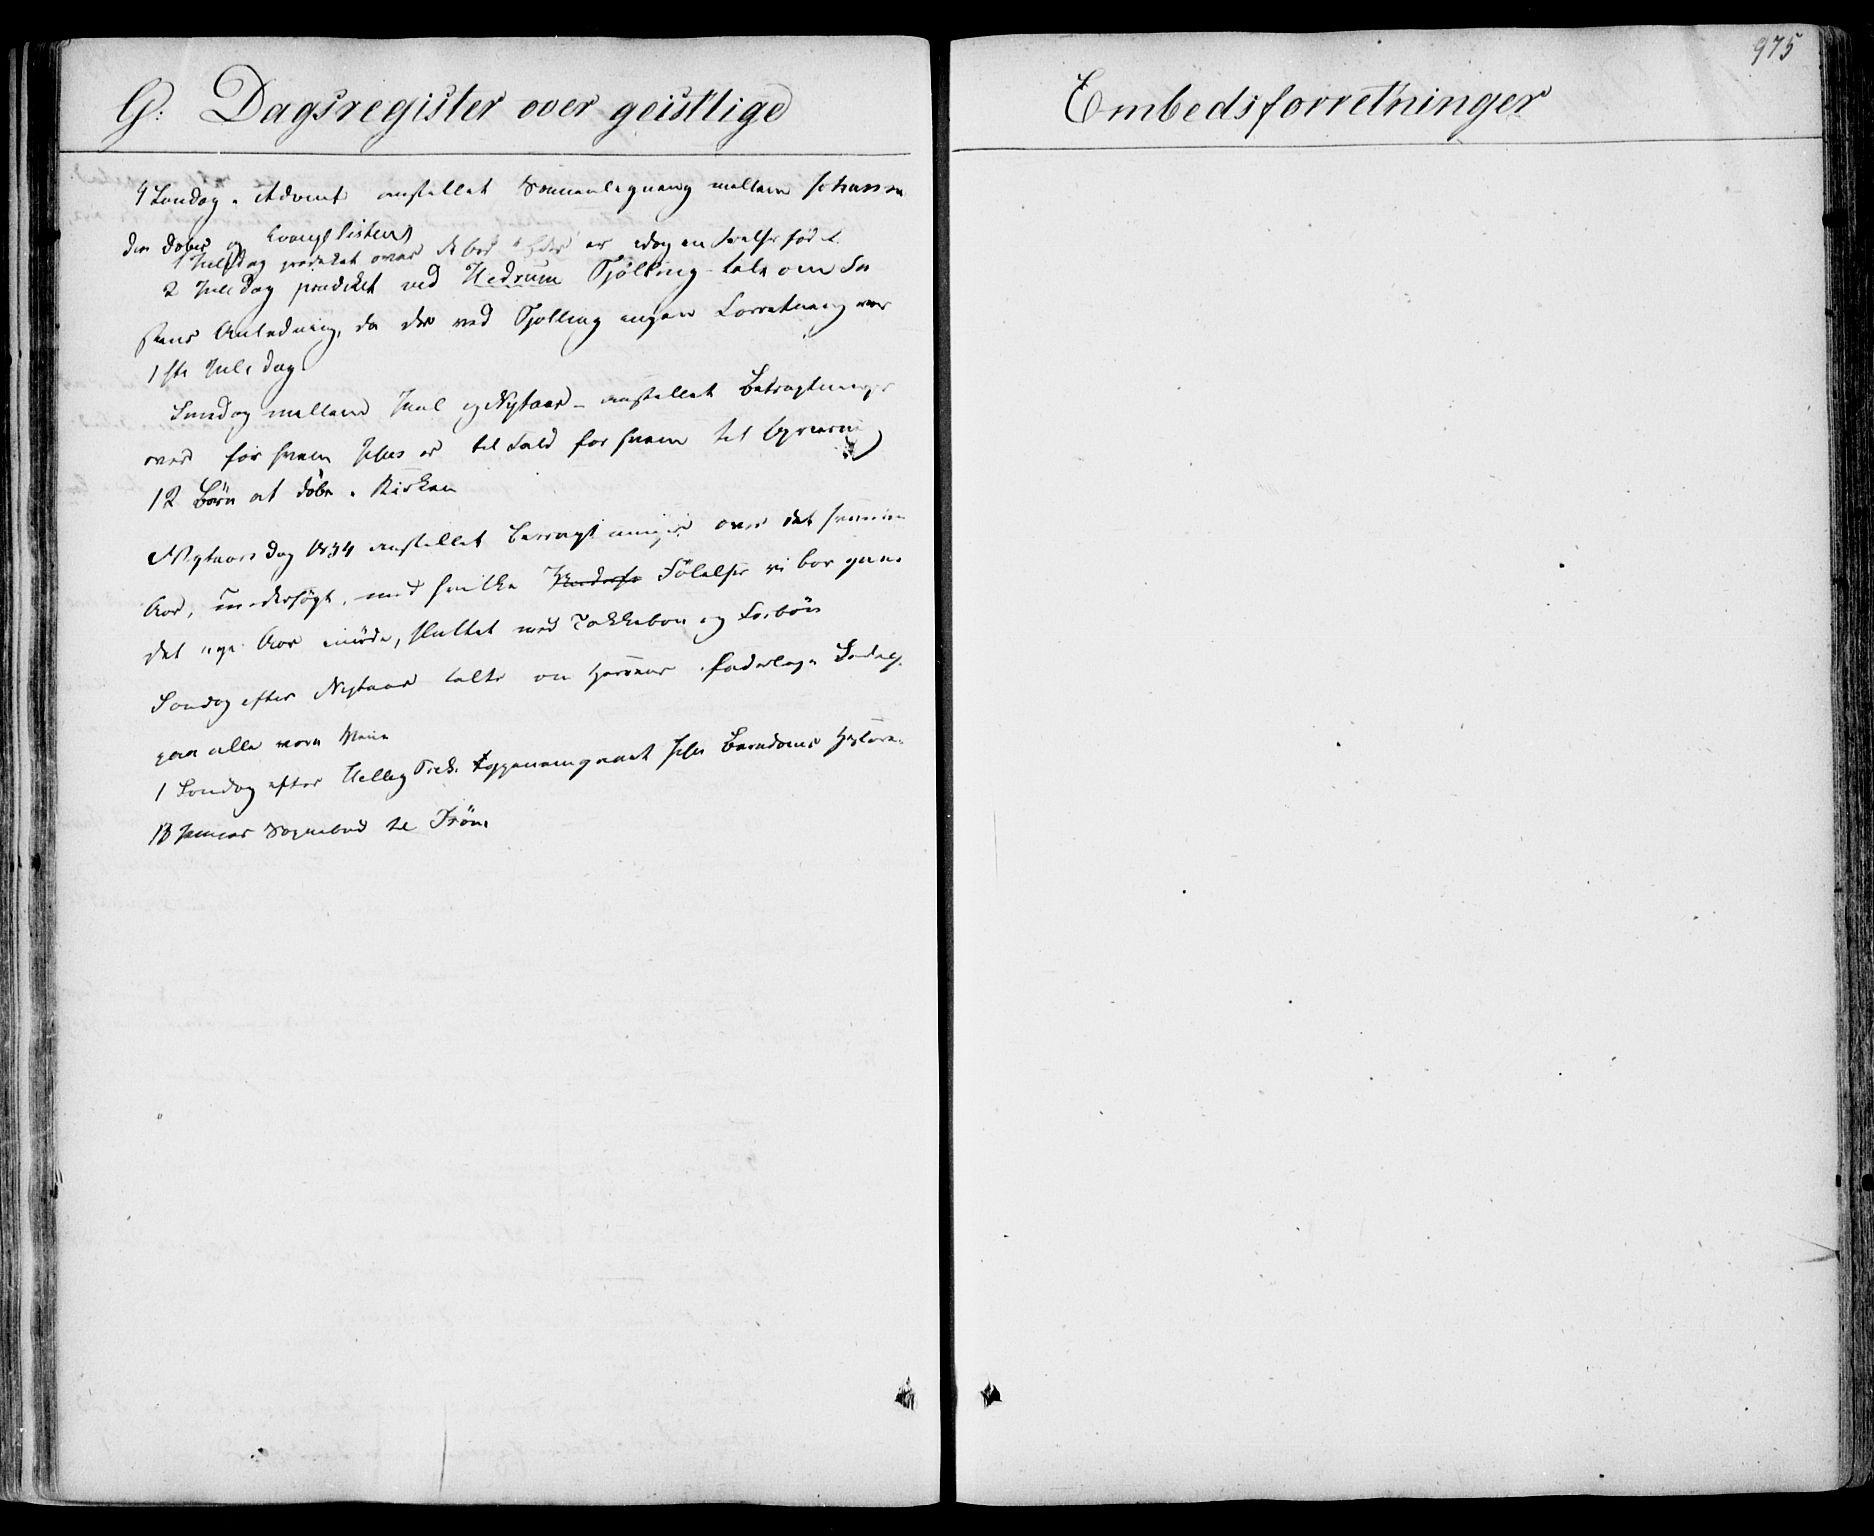 SAKO, Sandar kirkebøker, F/Fa/L0005: Parish register (official) no. 5, 1832-1847, p. 974-975